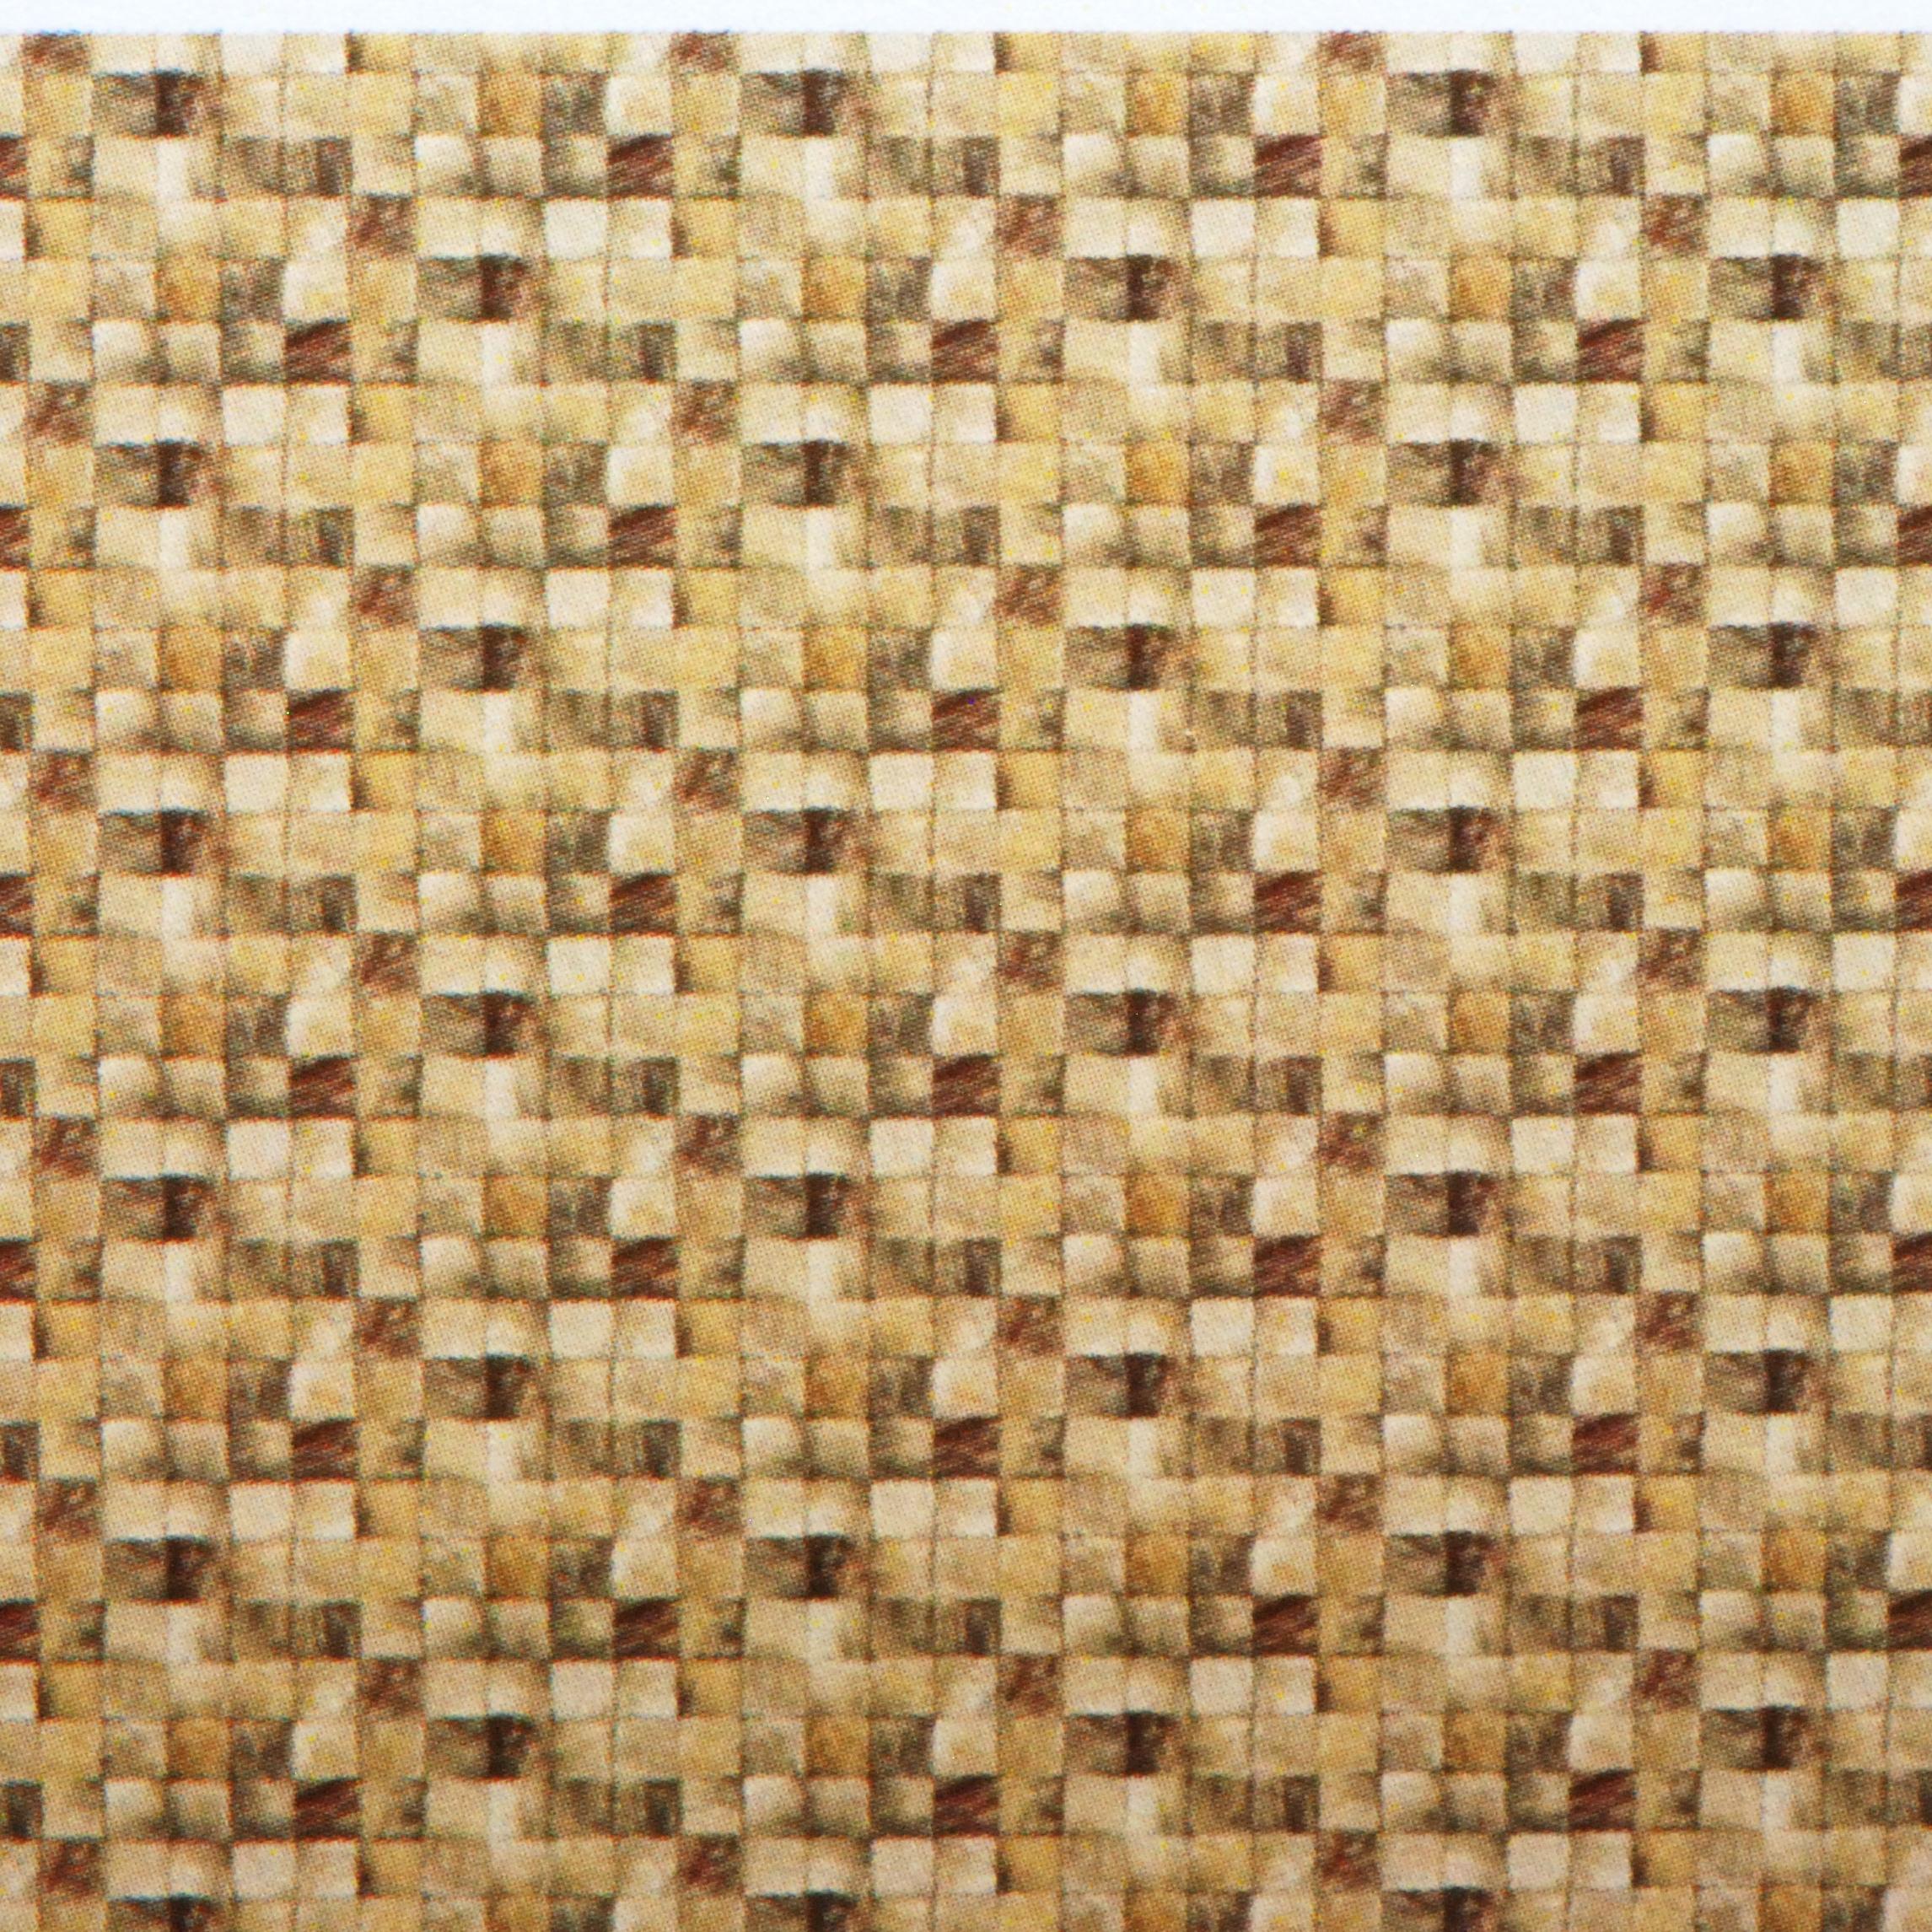 dollhouse wallpaper flooring and brick - photo #15